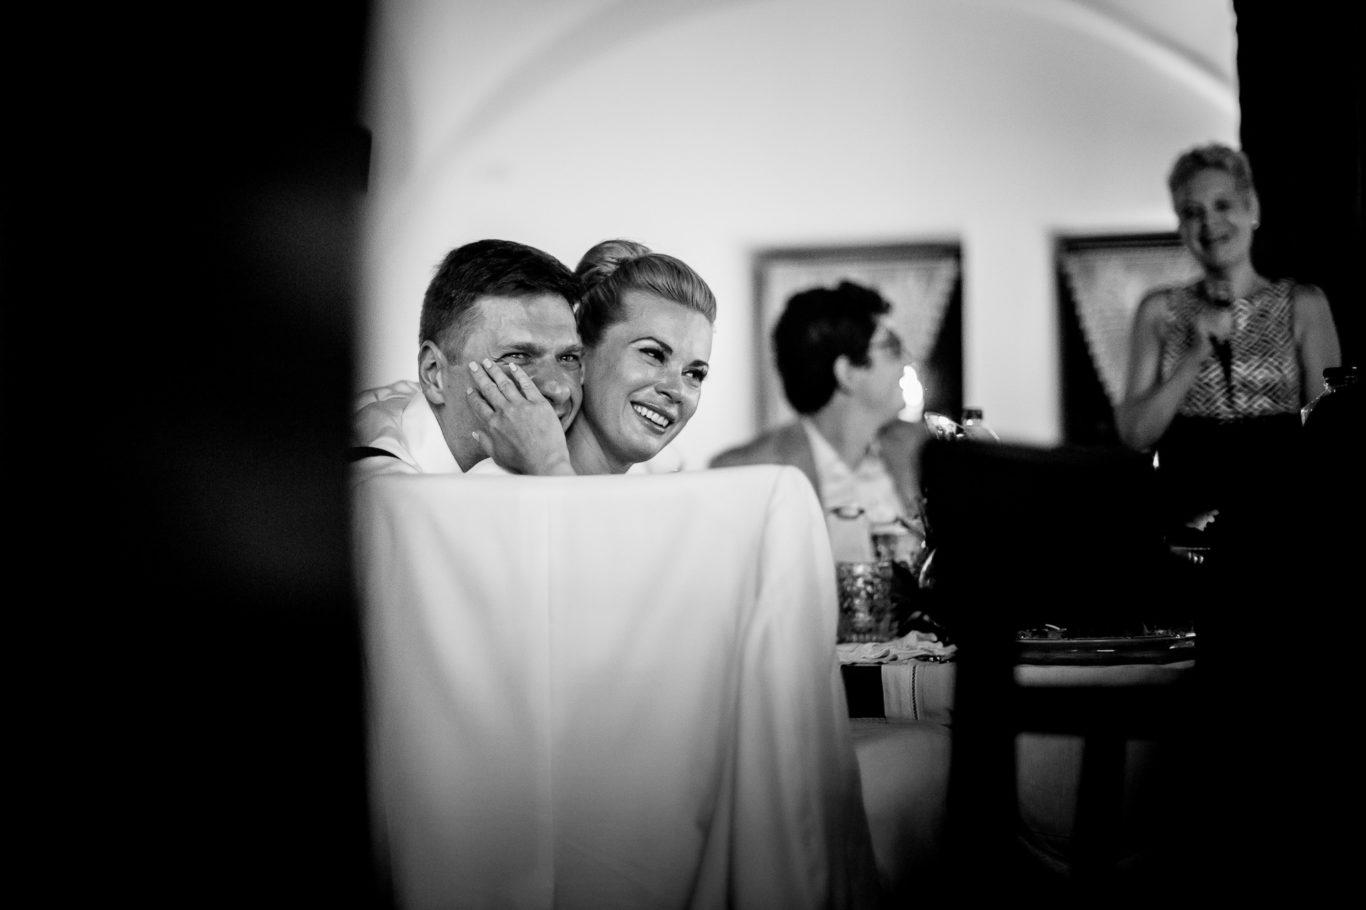 0750-fotoreportaj-nunta-conacul-maldar-cristina-stefan-fotograf-ciprian-dumitrescu-cd2_4064